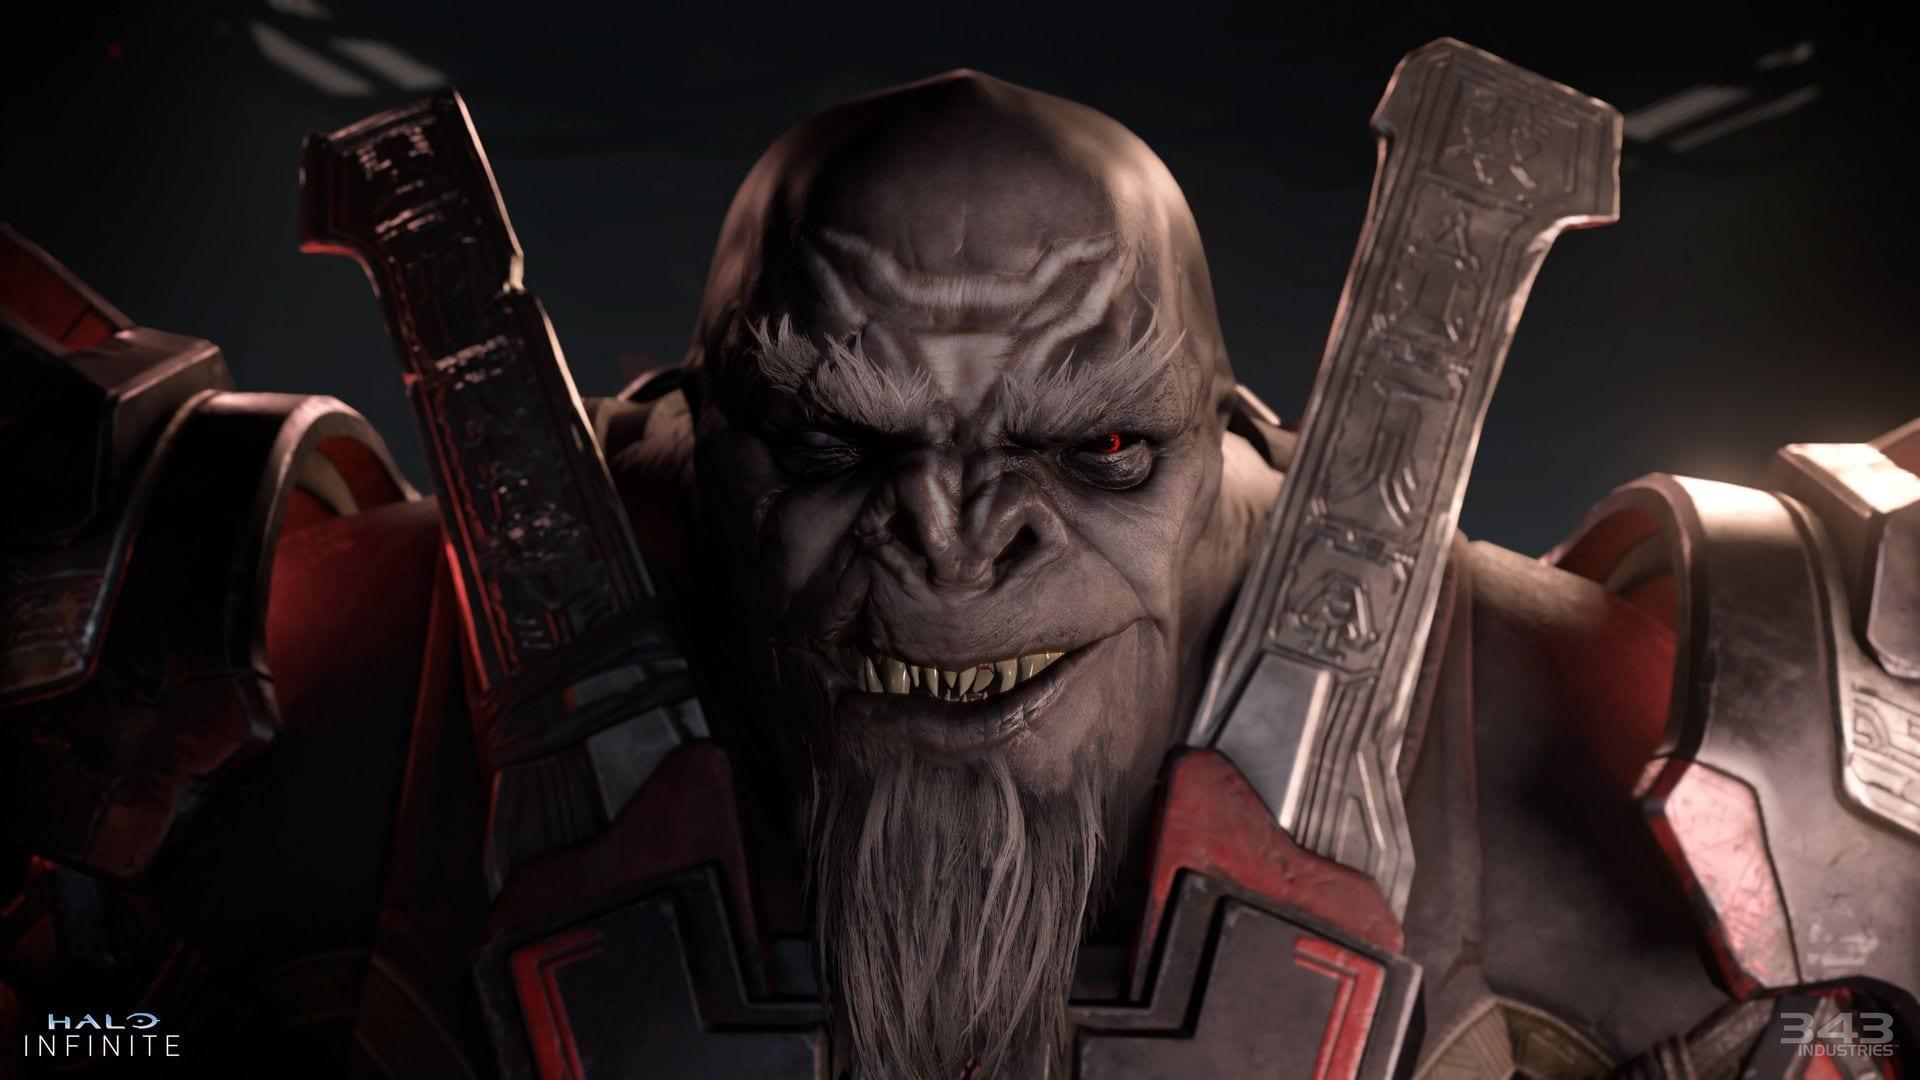 Halo Infinite Delayed Until 2021, Xbox series X Arrives in November